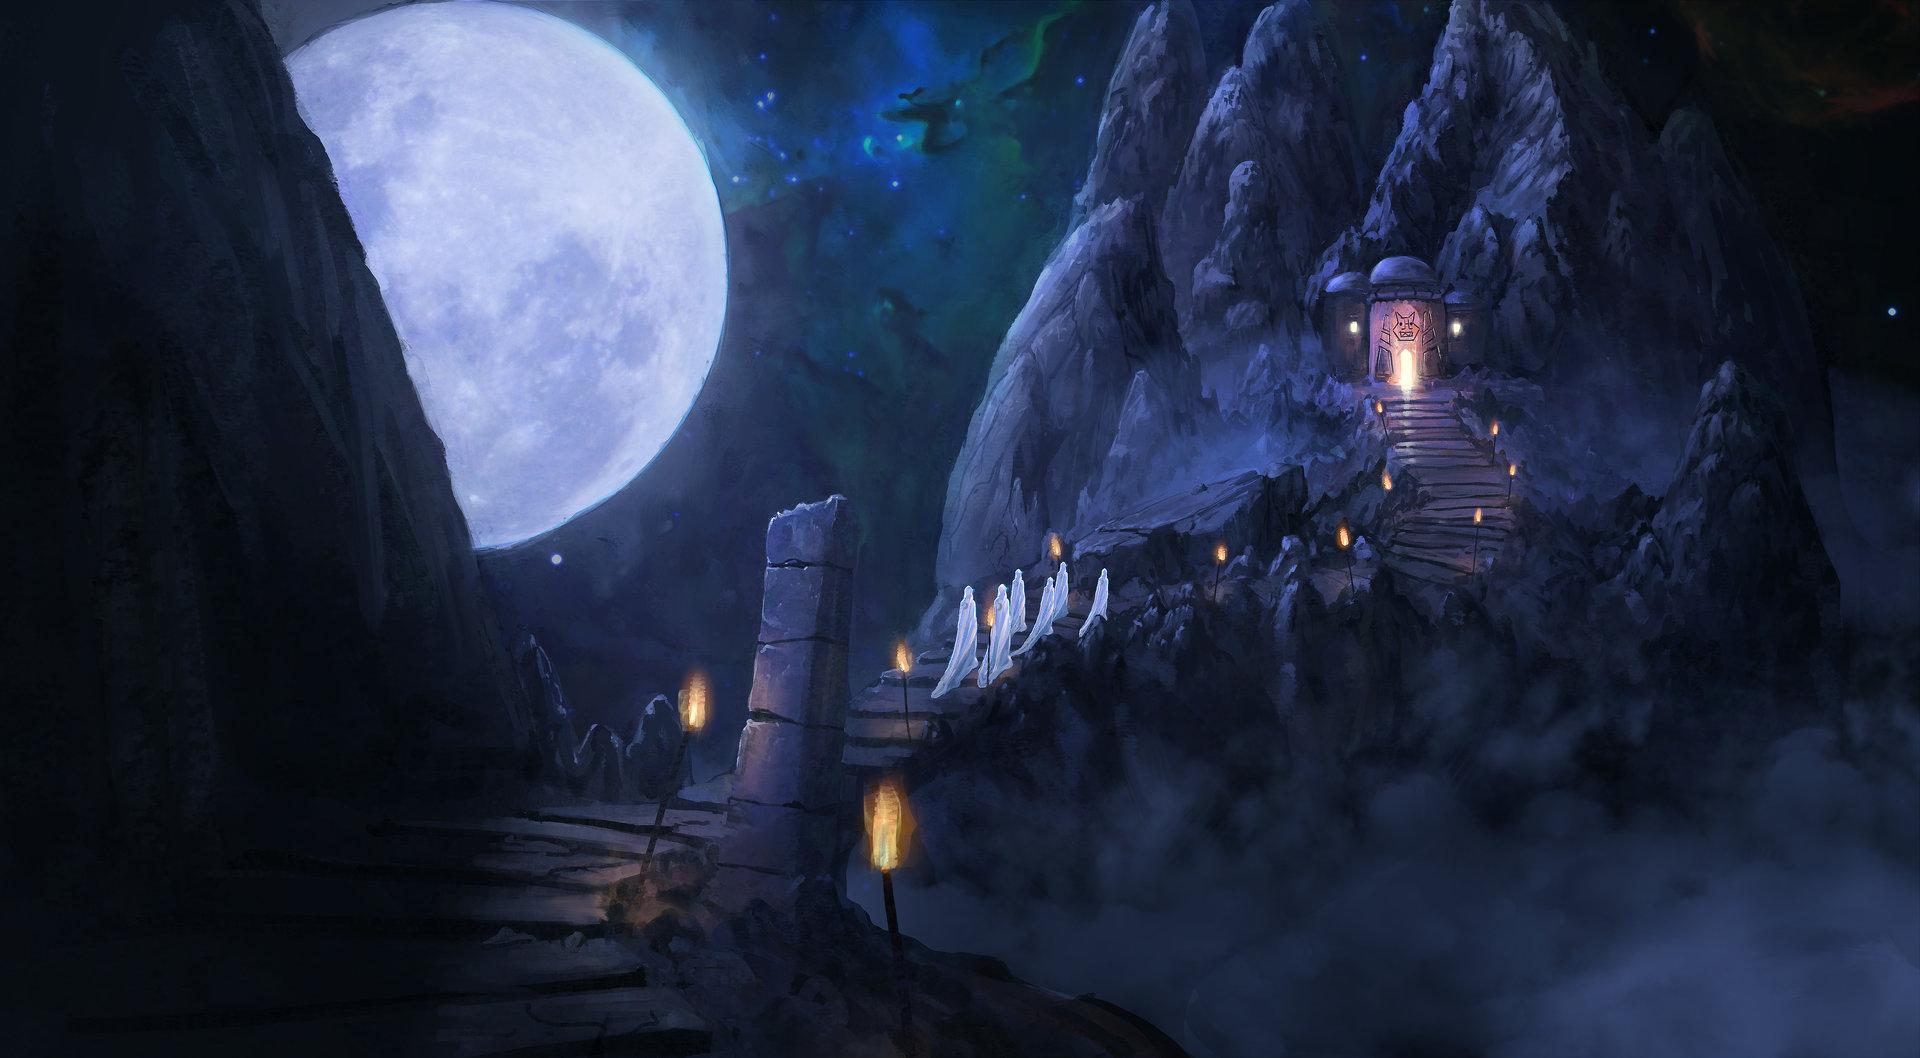 Ryan groskamp the moon observatory no aut